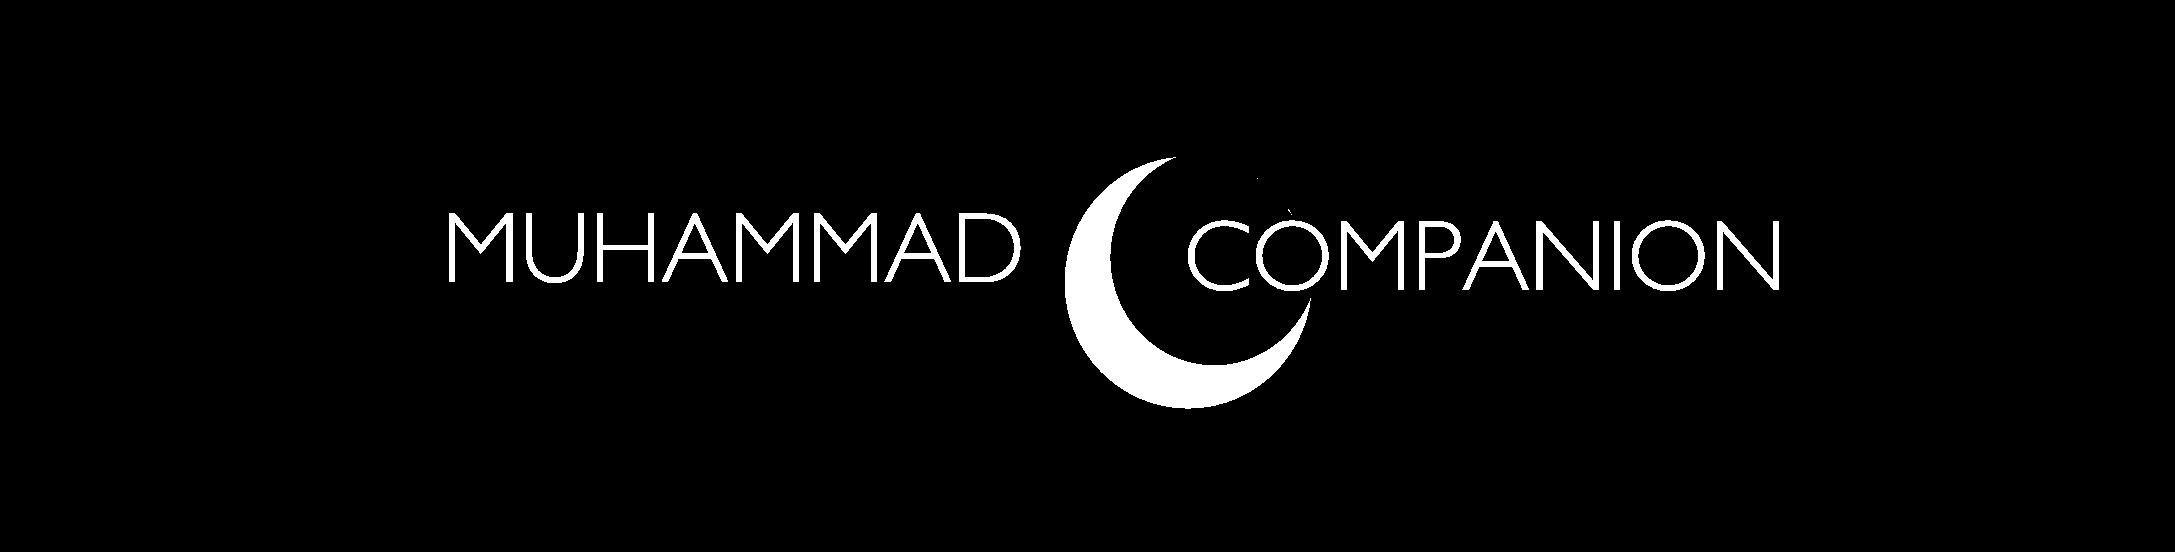 Muhammad Companion